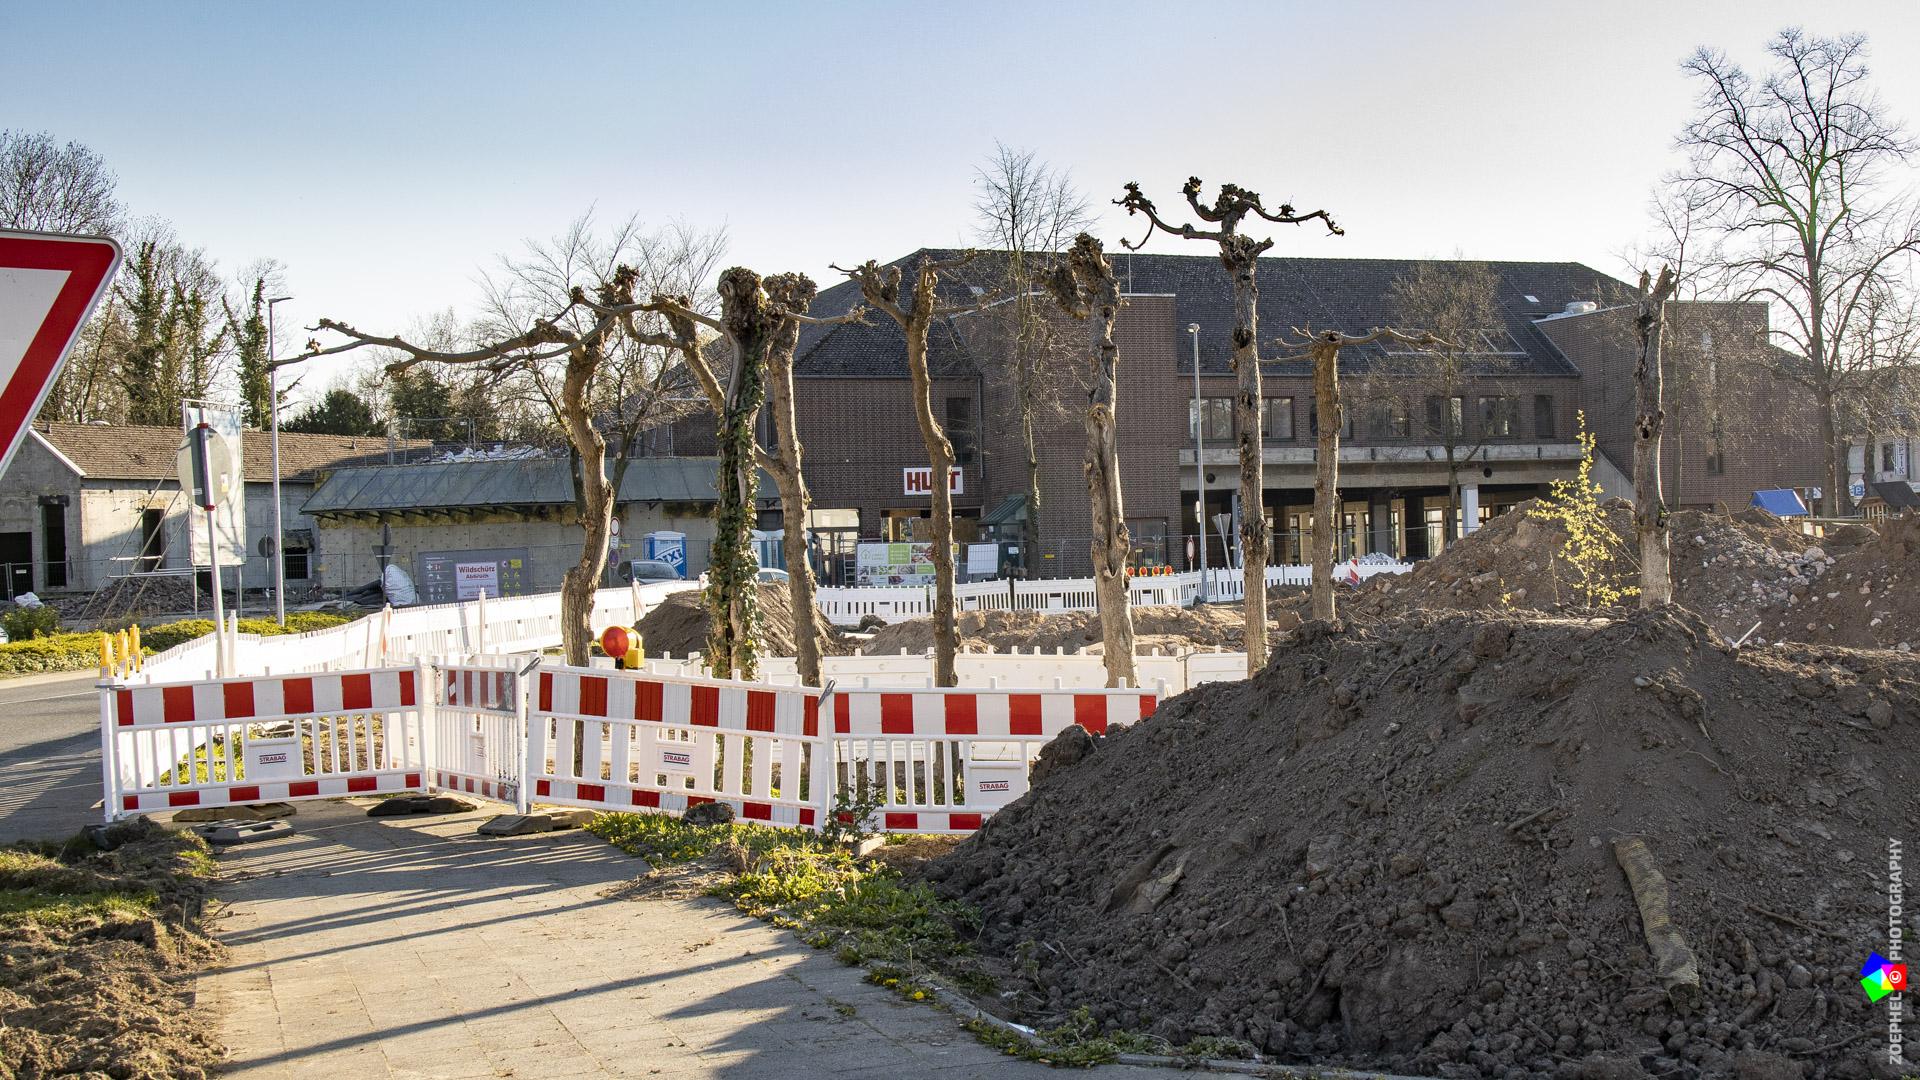 Laubengang Schloss Bedburg – April 2020